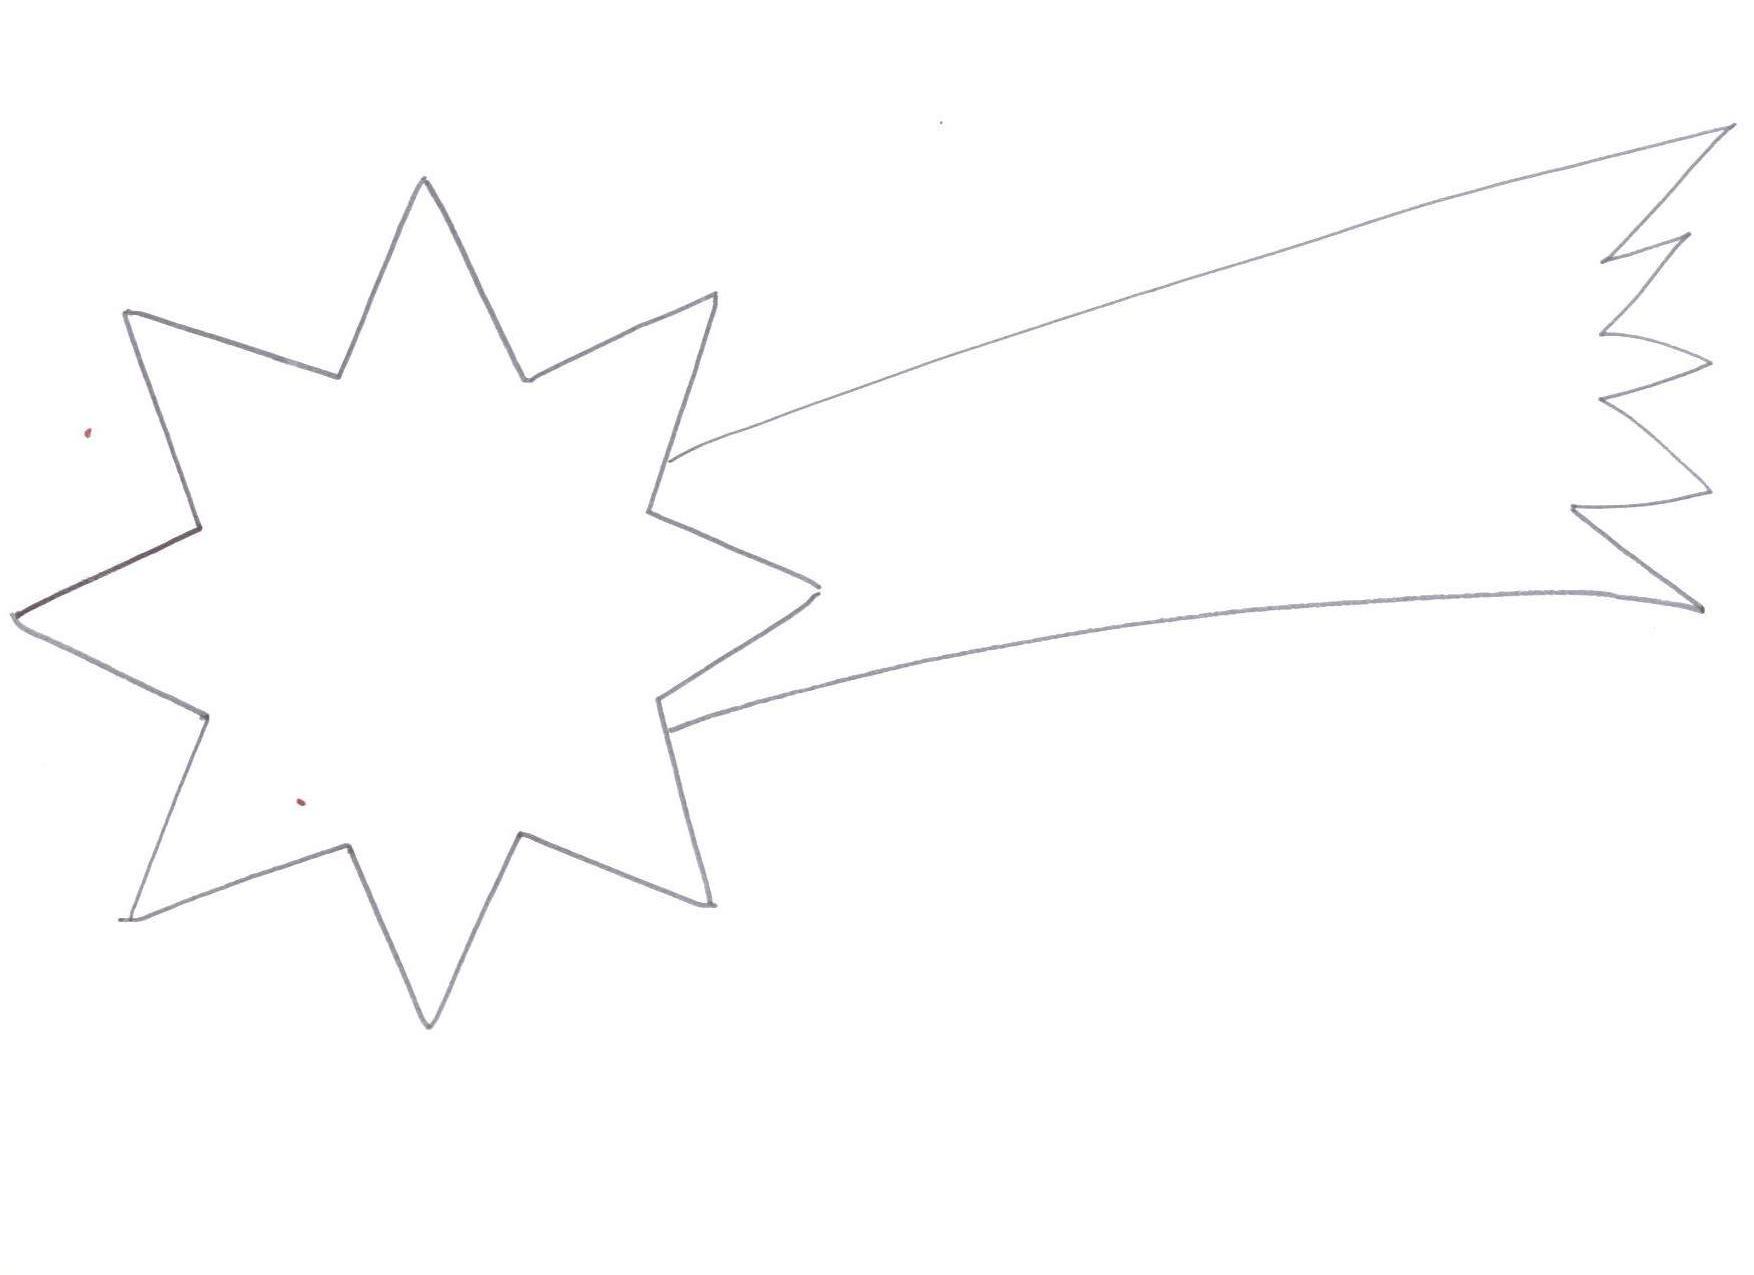 kometa3.jpg